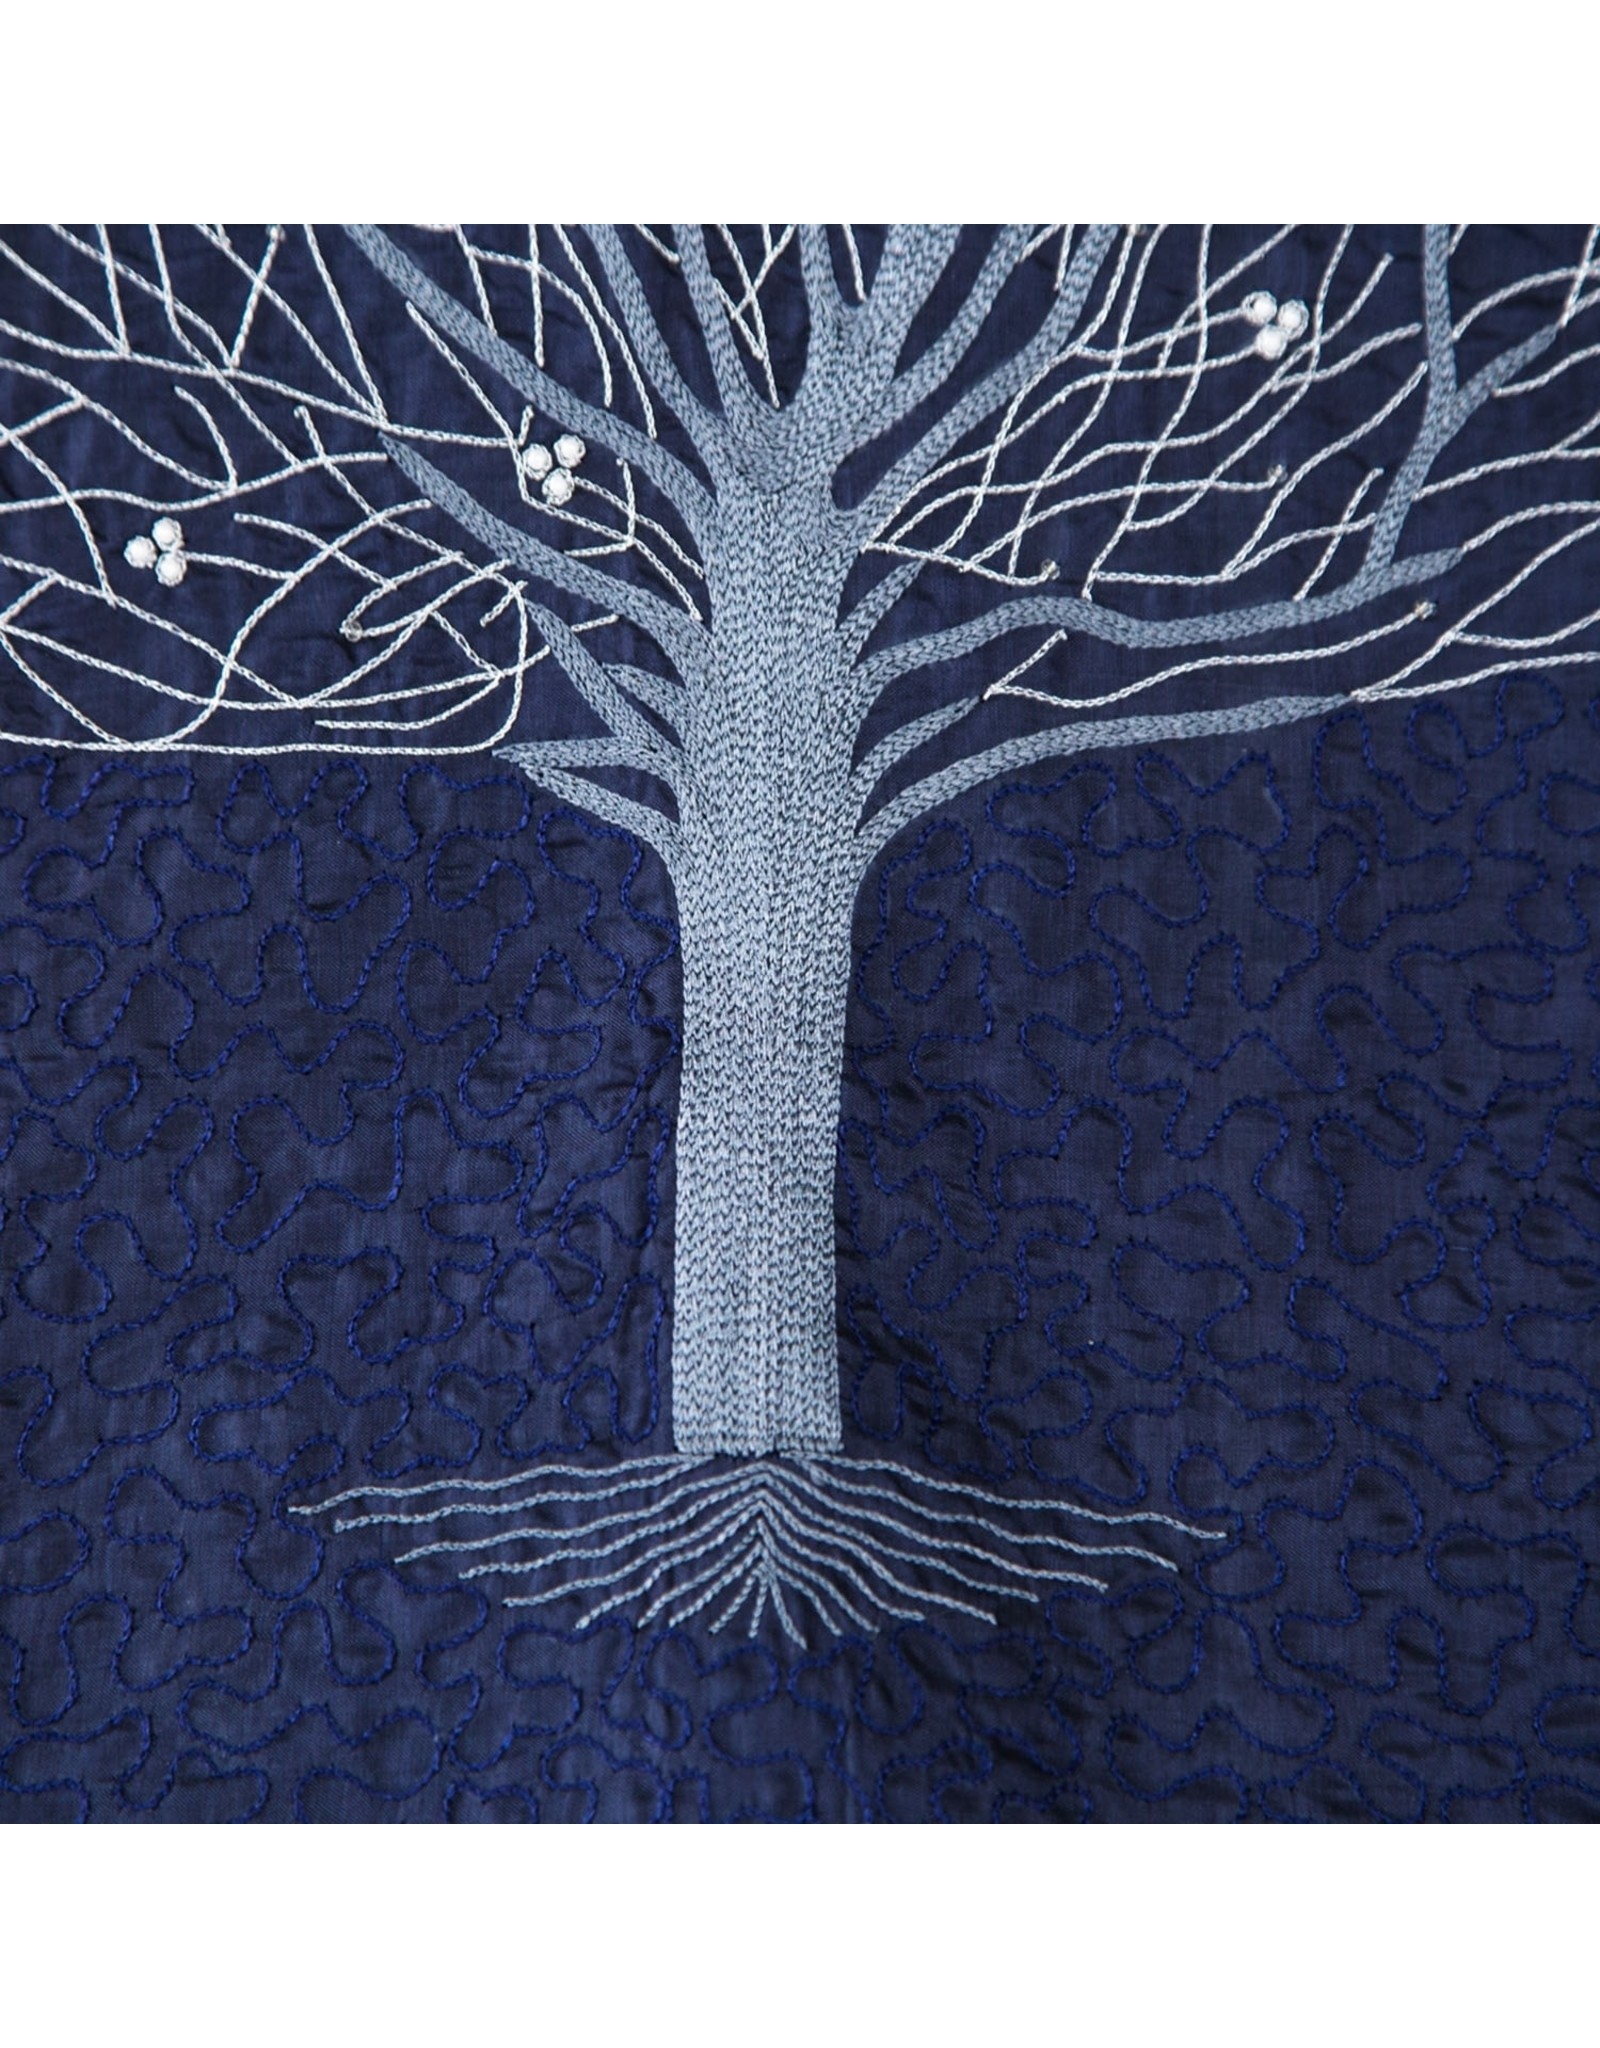 TTV USA Tree of Dreams Wall Hanging, India